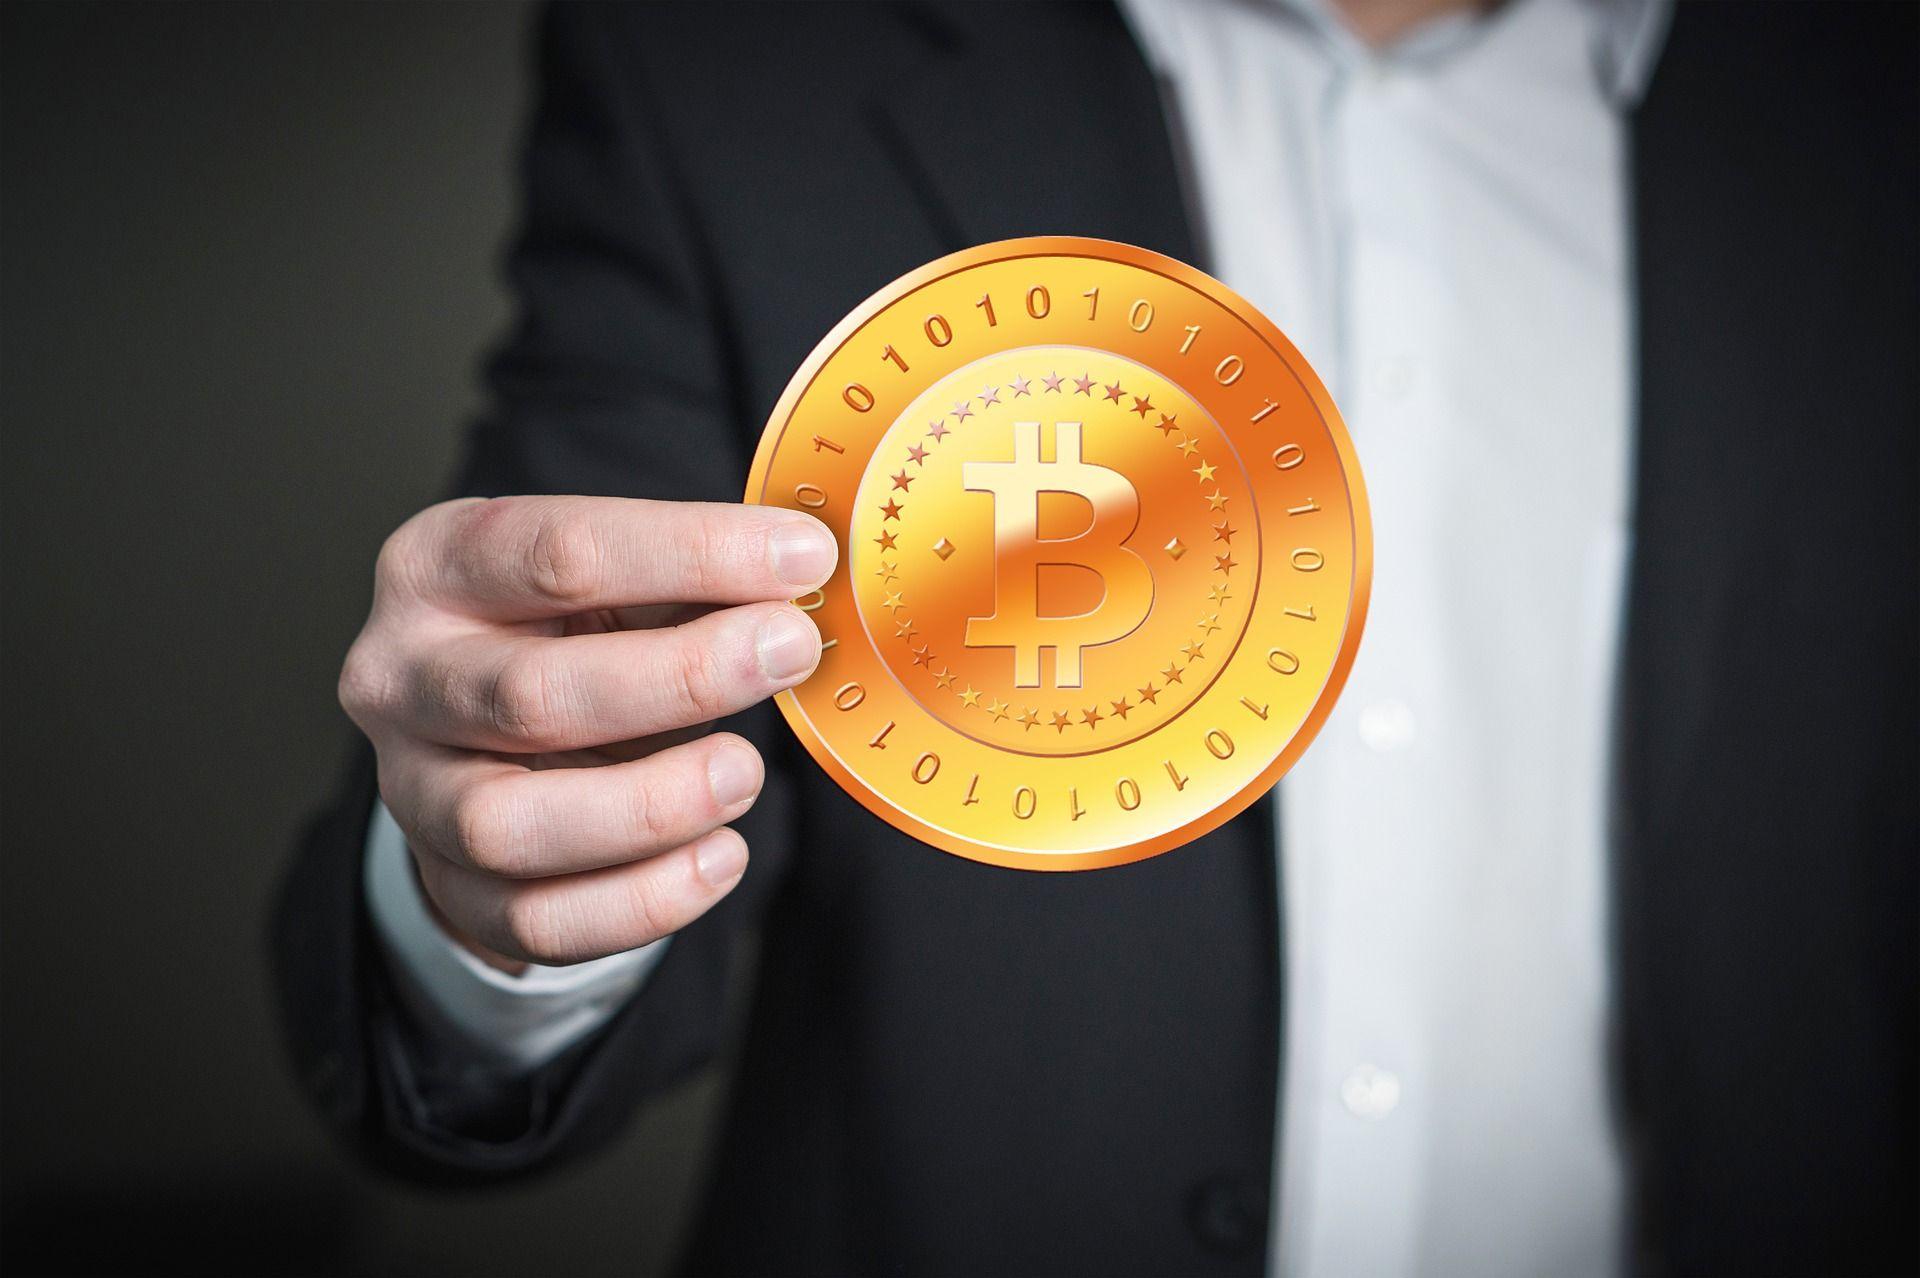 Pin On Bitcoin Hd 4k Wallpapers